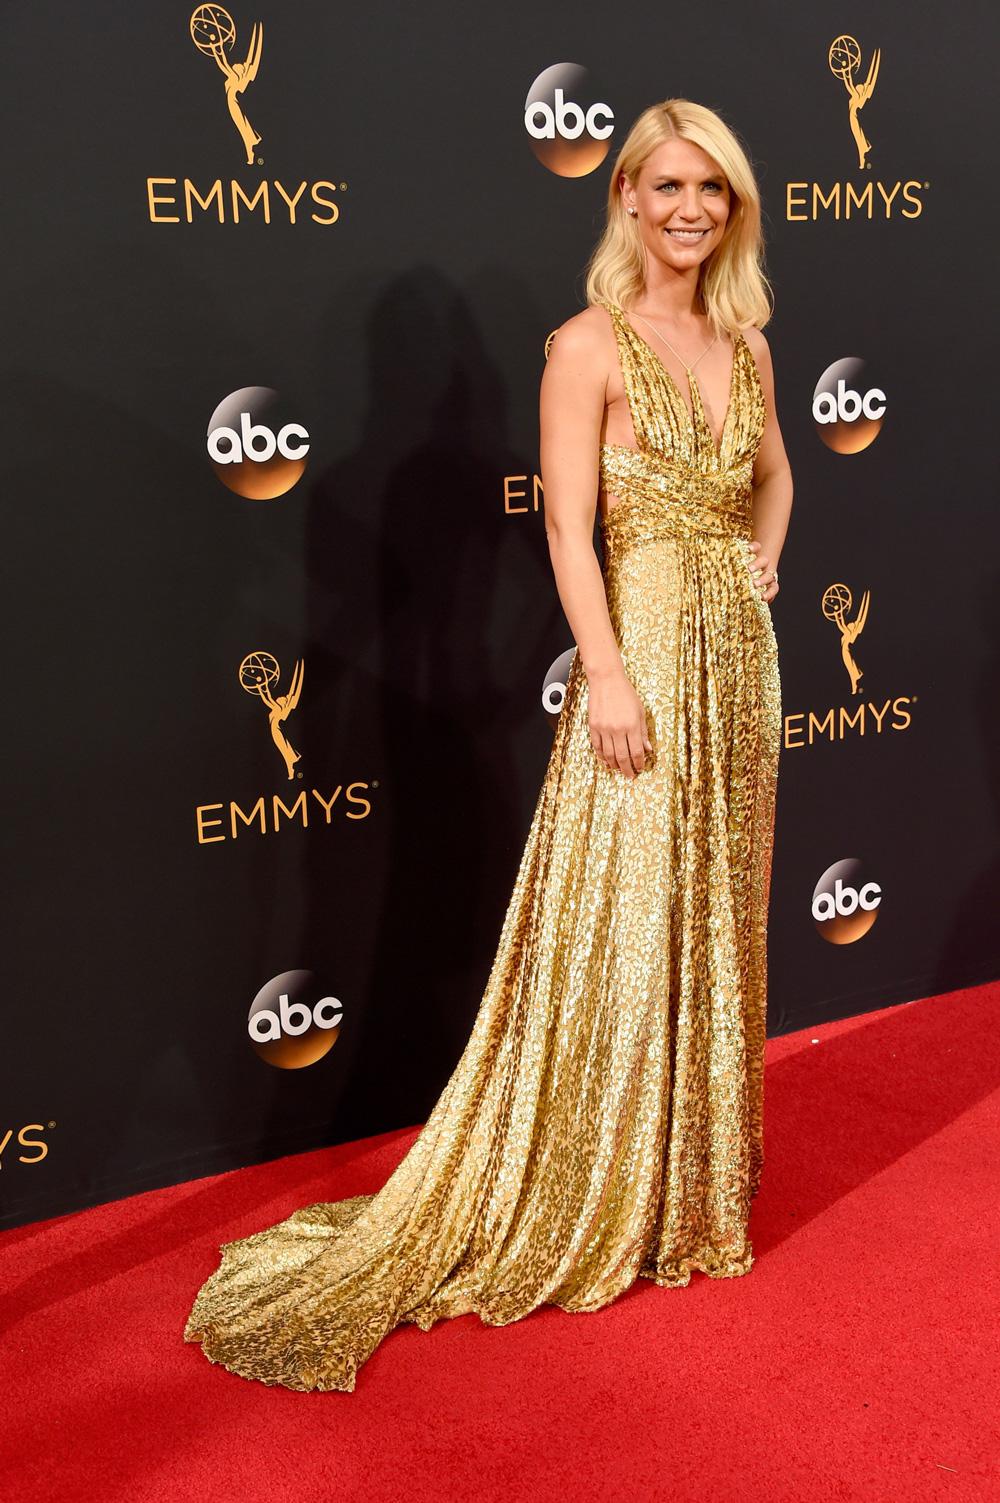 Gaya Mega Bintang Televisi Dalam Gelaran Tahunan Primetime Emmy Award 2016